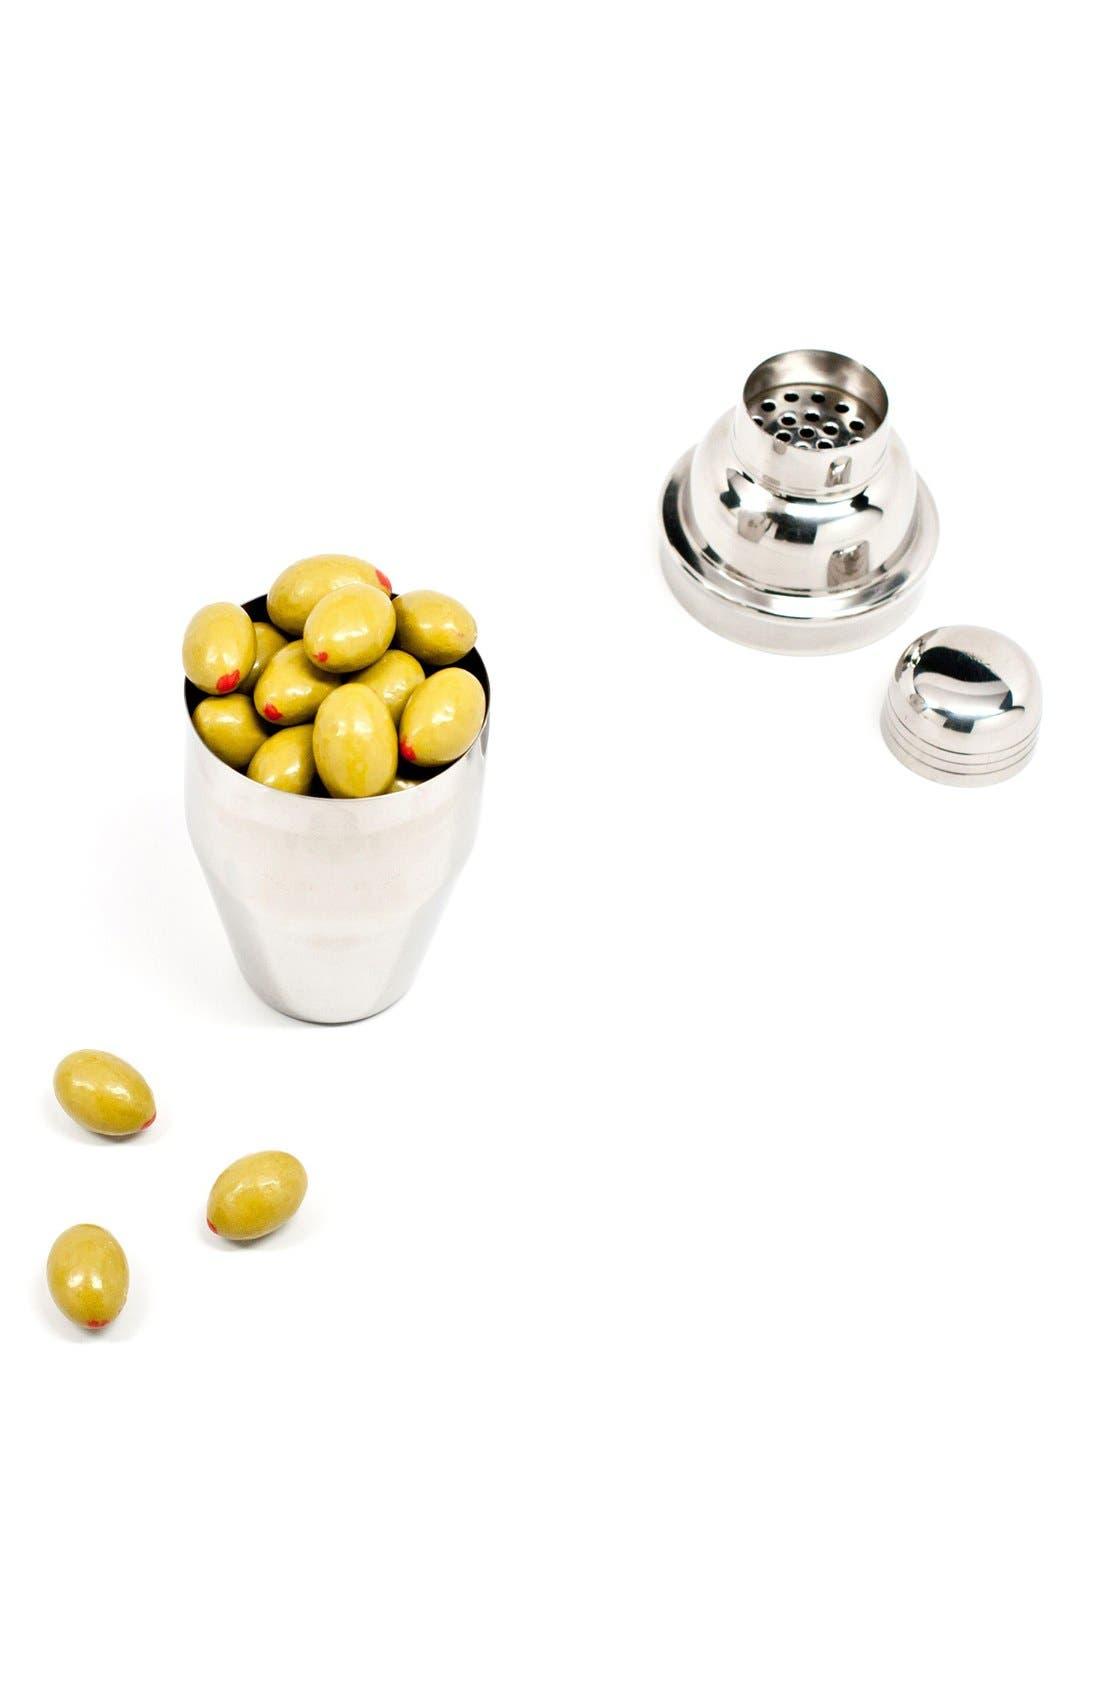 Alternate Image 2  - sugarfina 'Mini Martini' Shaker & Candy Gift Set